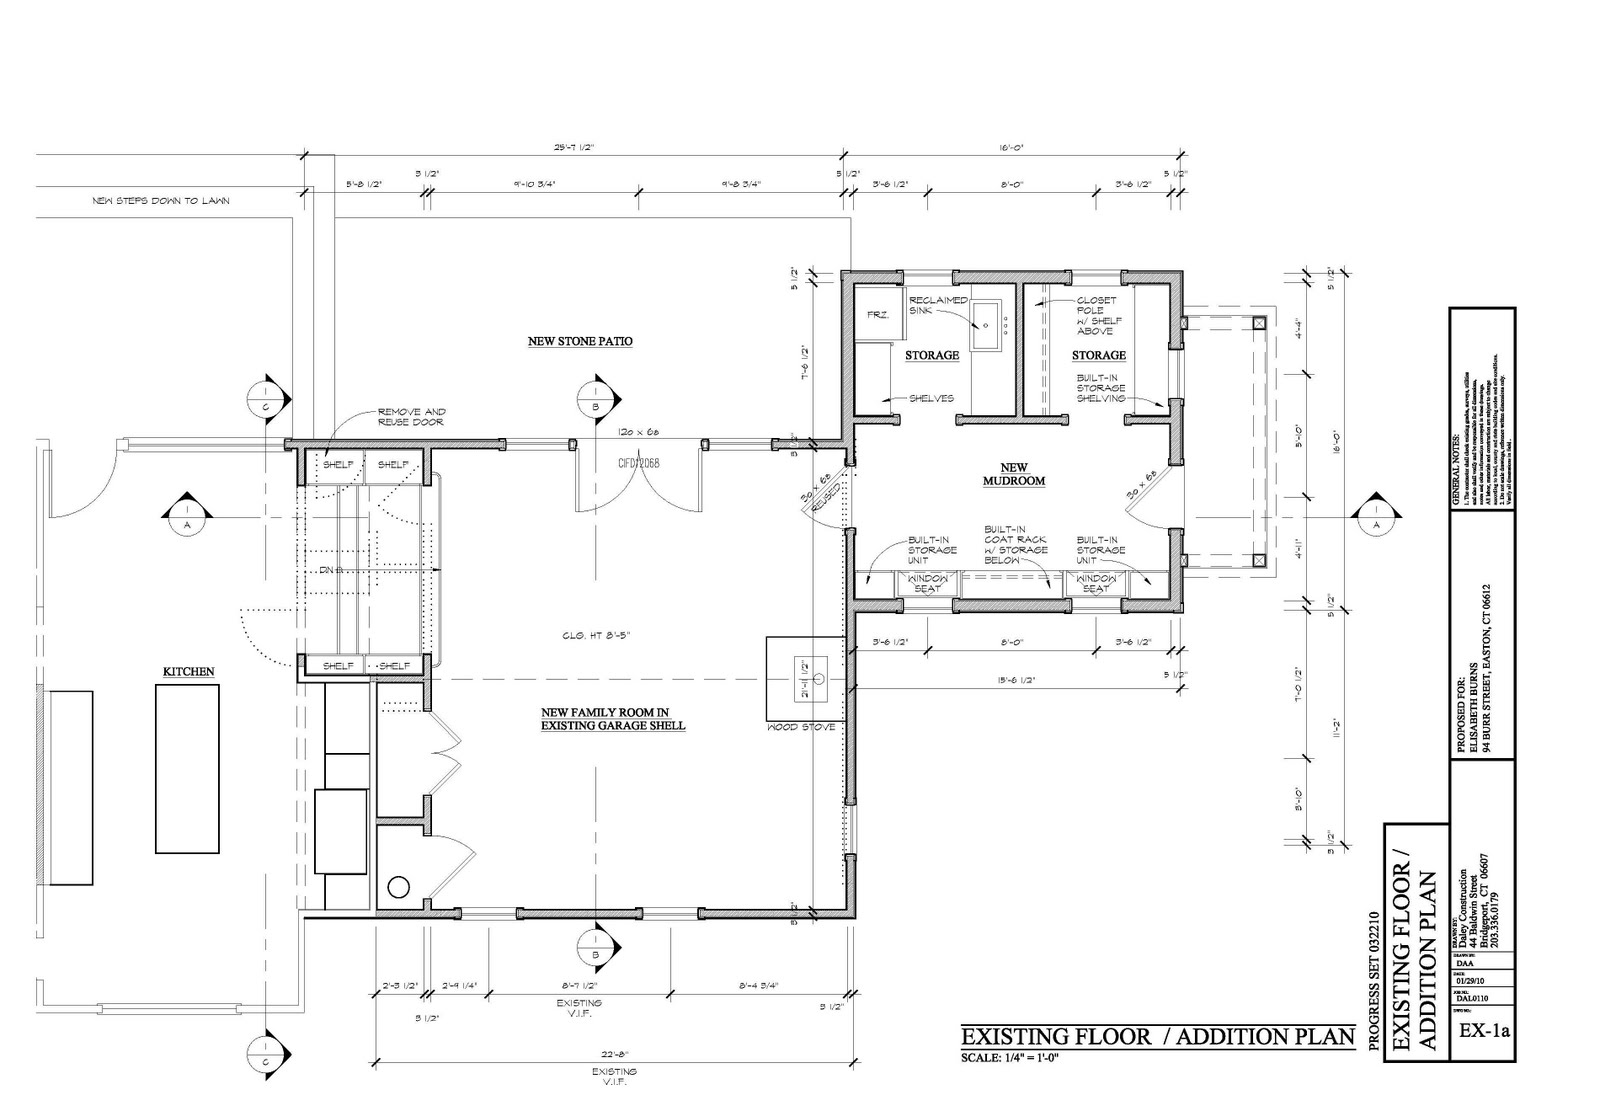 Repair shop floor plans floor plans for Auto shop floor plans